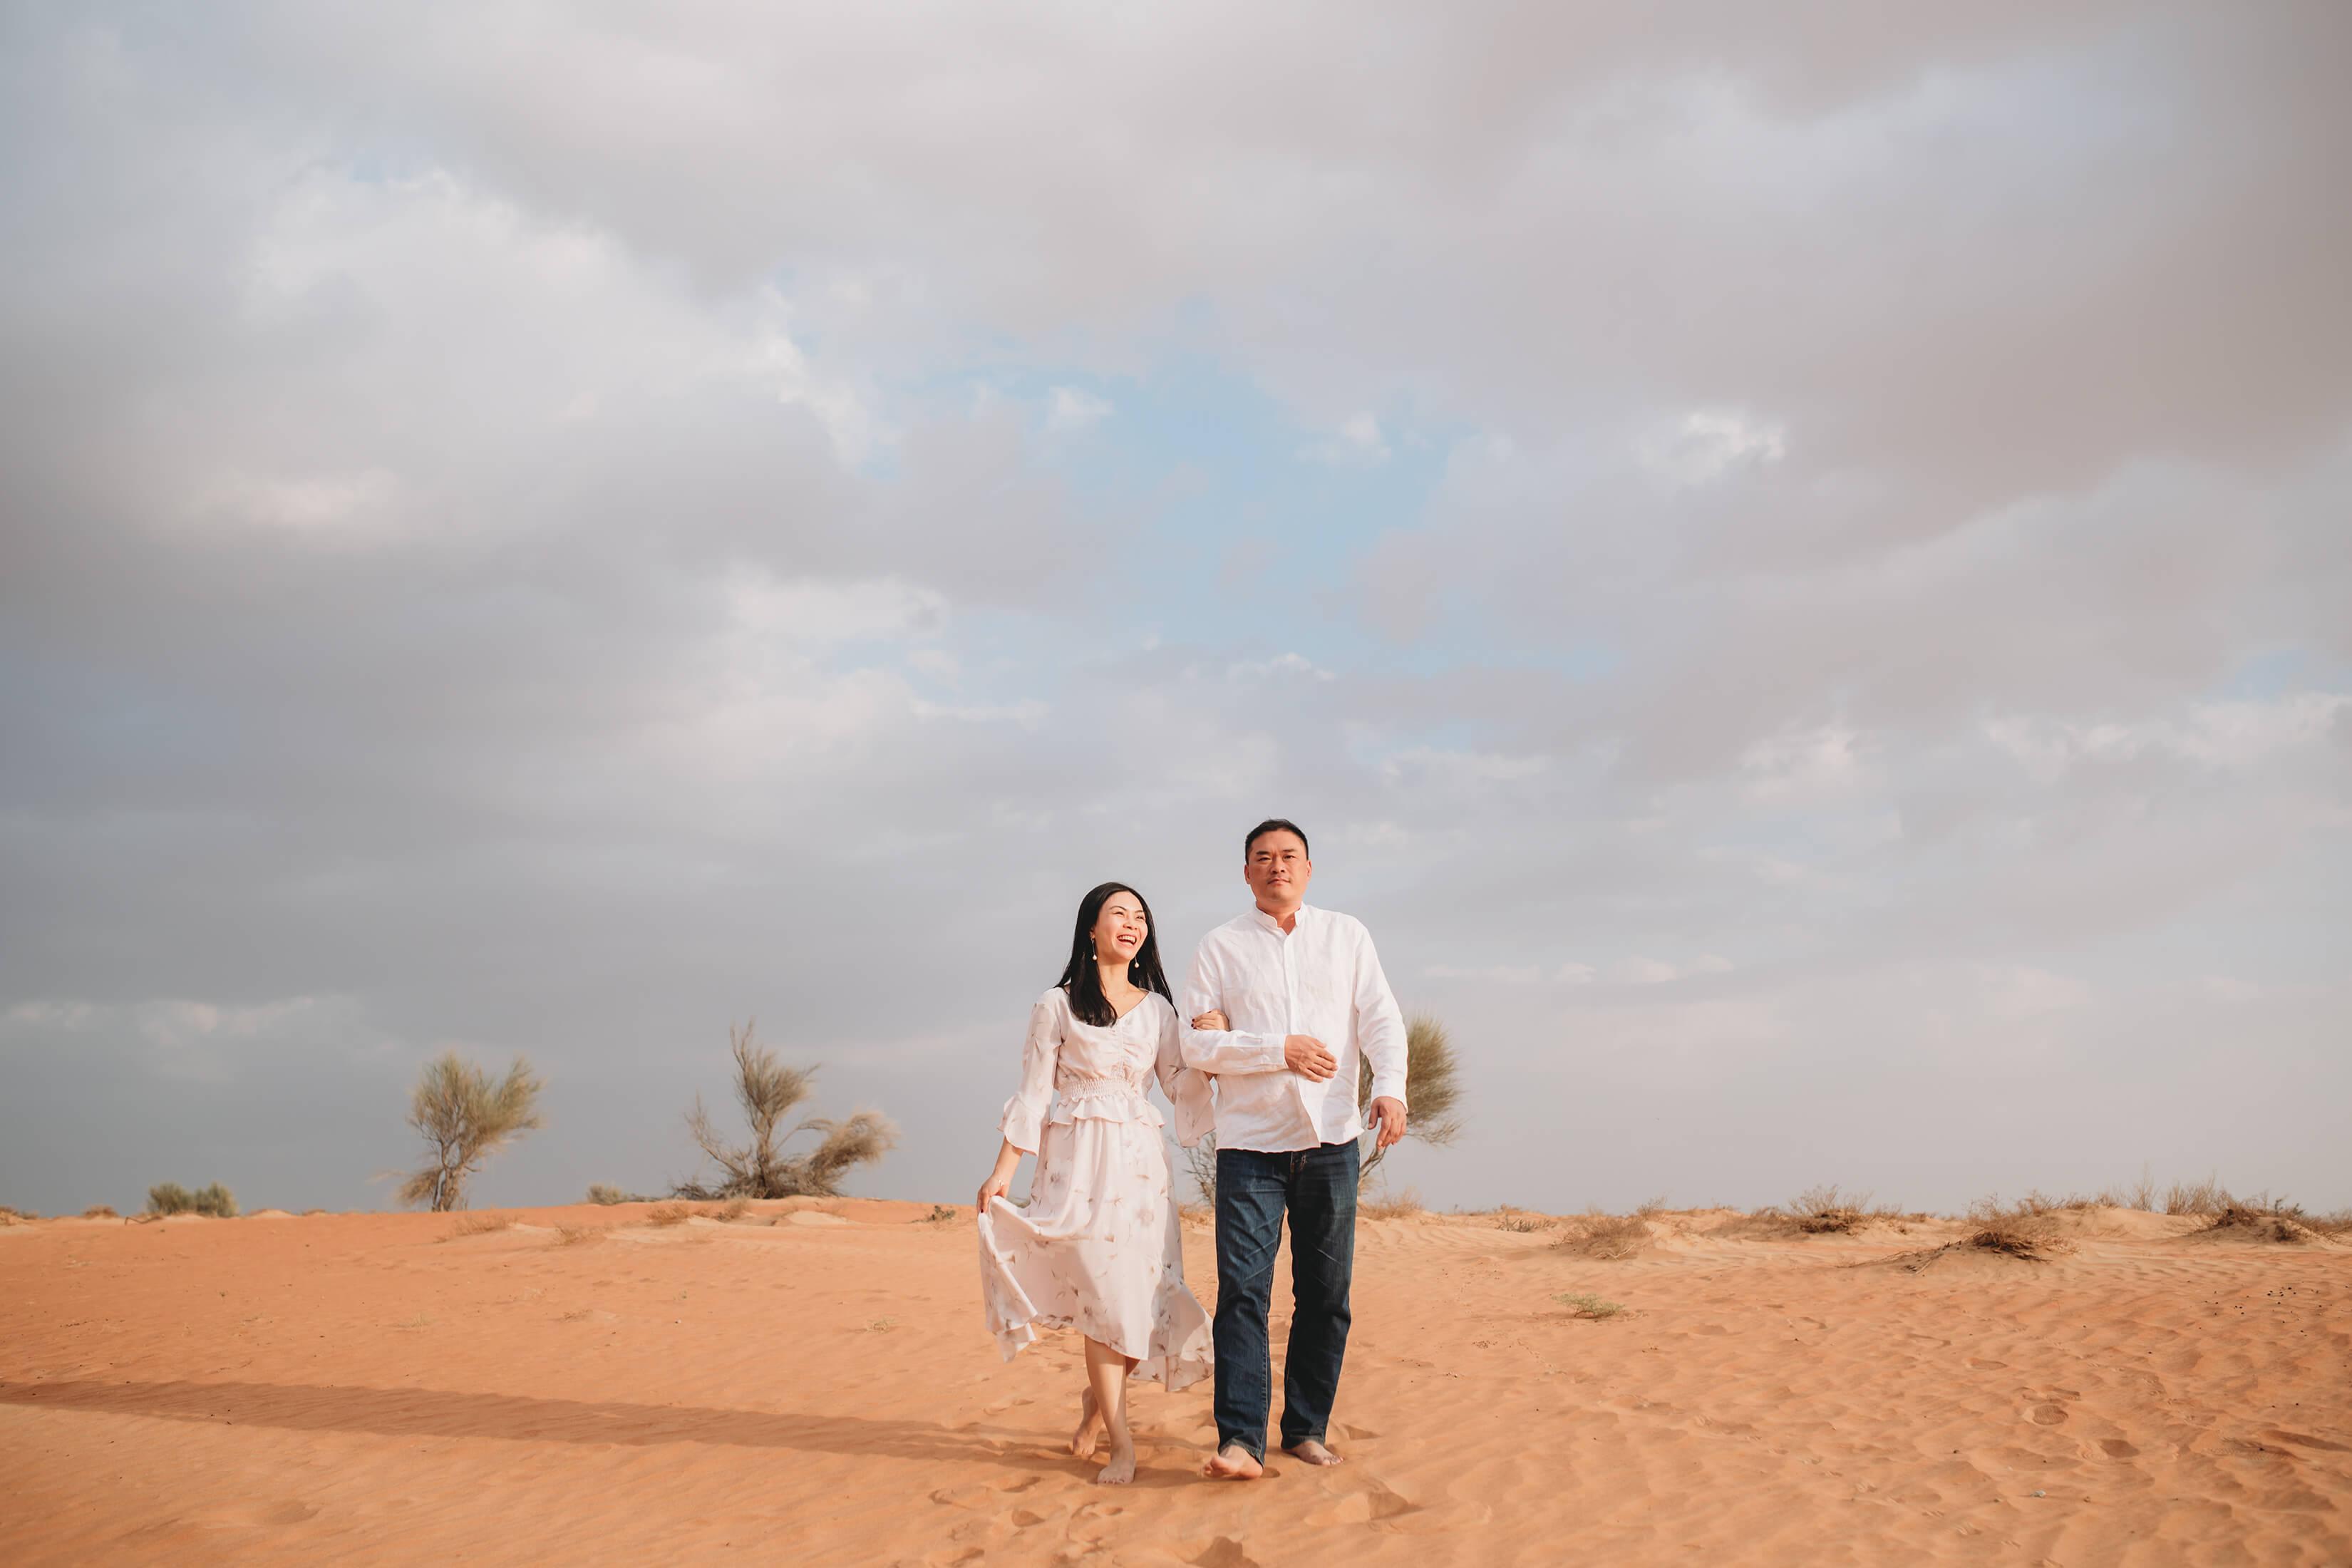 A couple walking in the Dubai desert in Dubai, United Arab Emirates